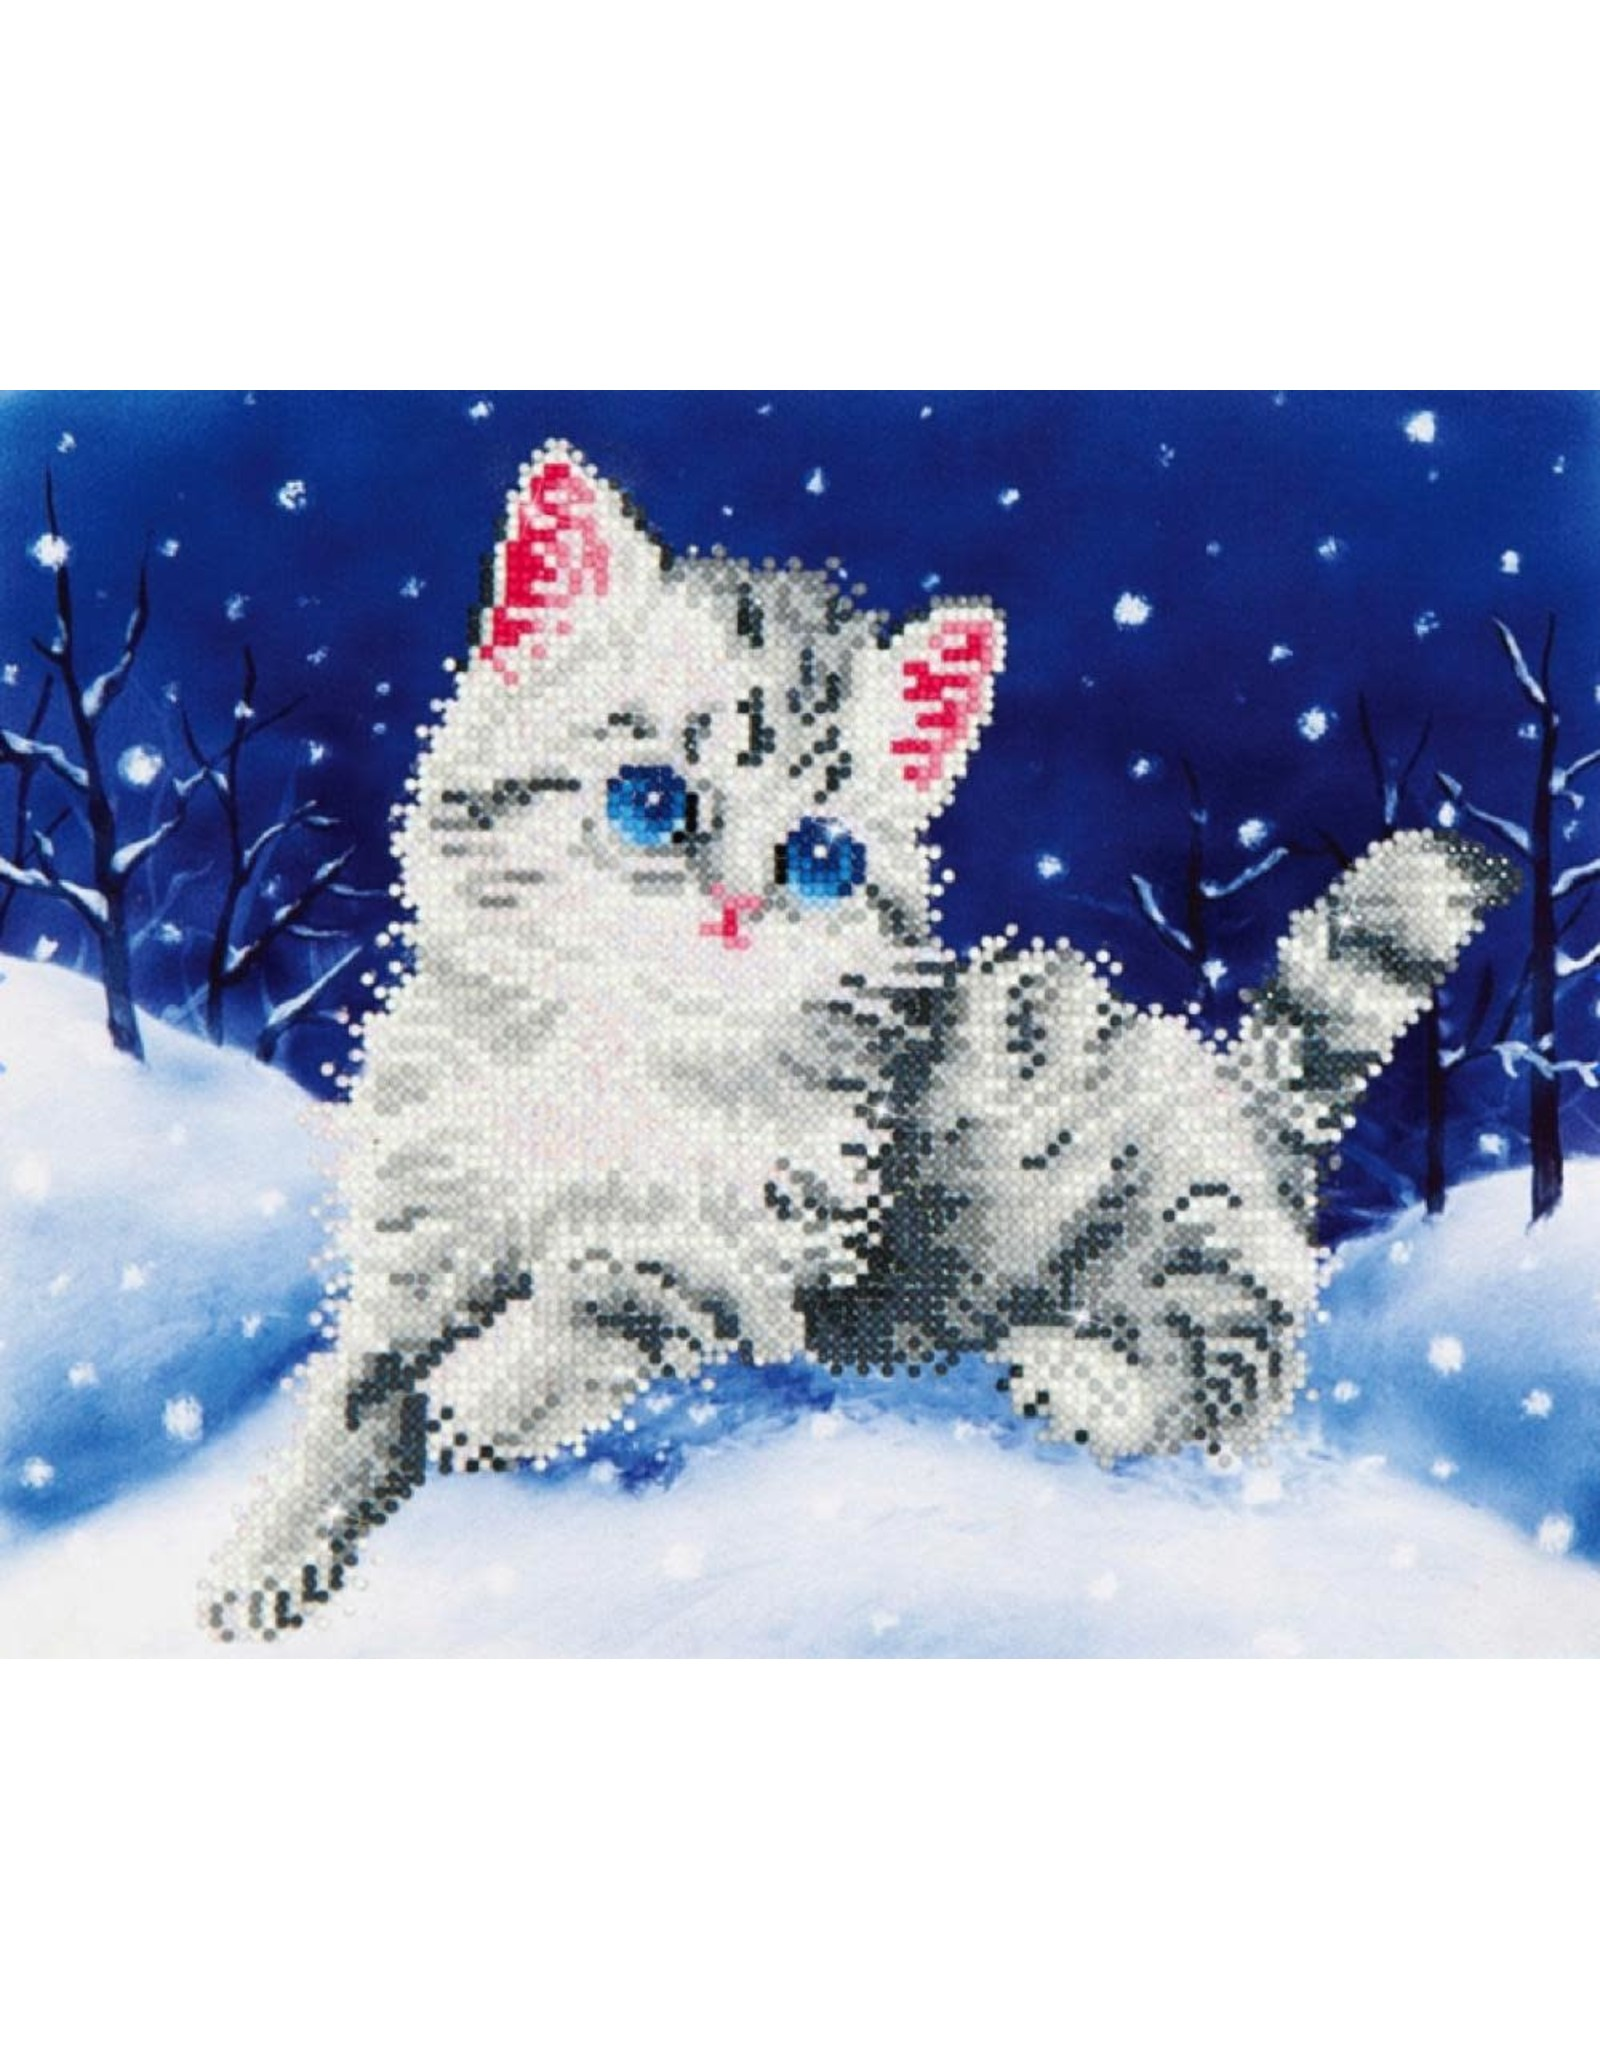 Diamond Dotz Diamond Dotz Kitten in the Snow (intermediate)